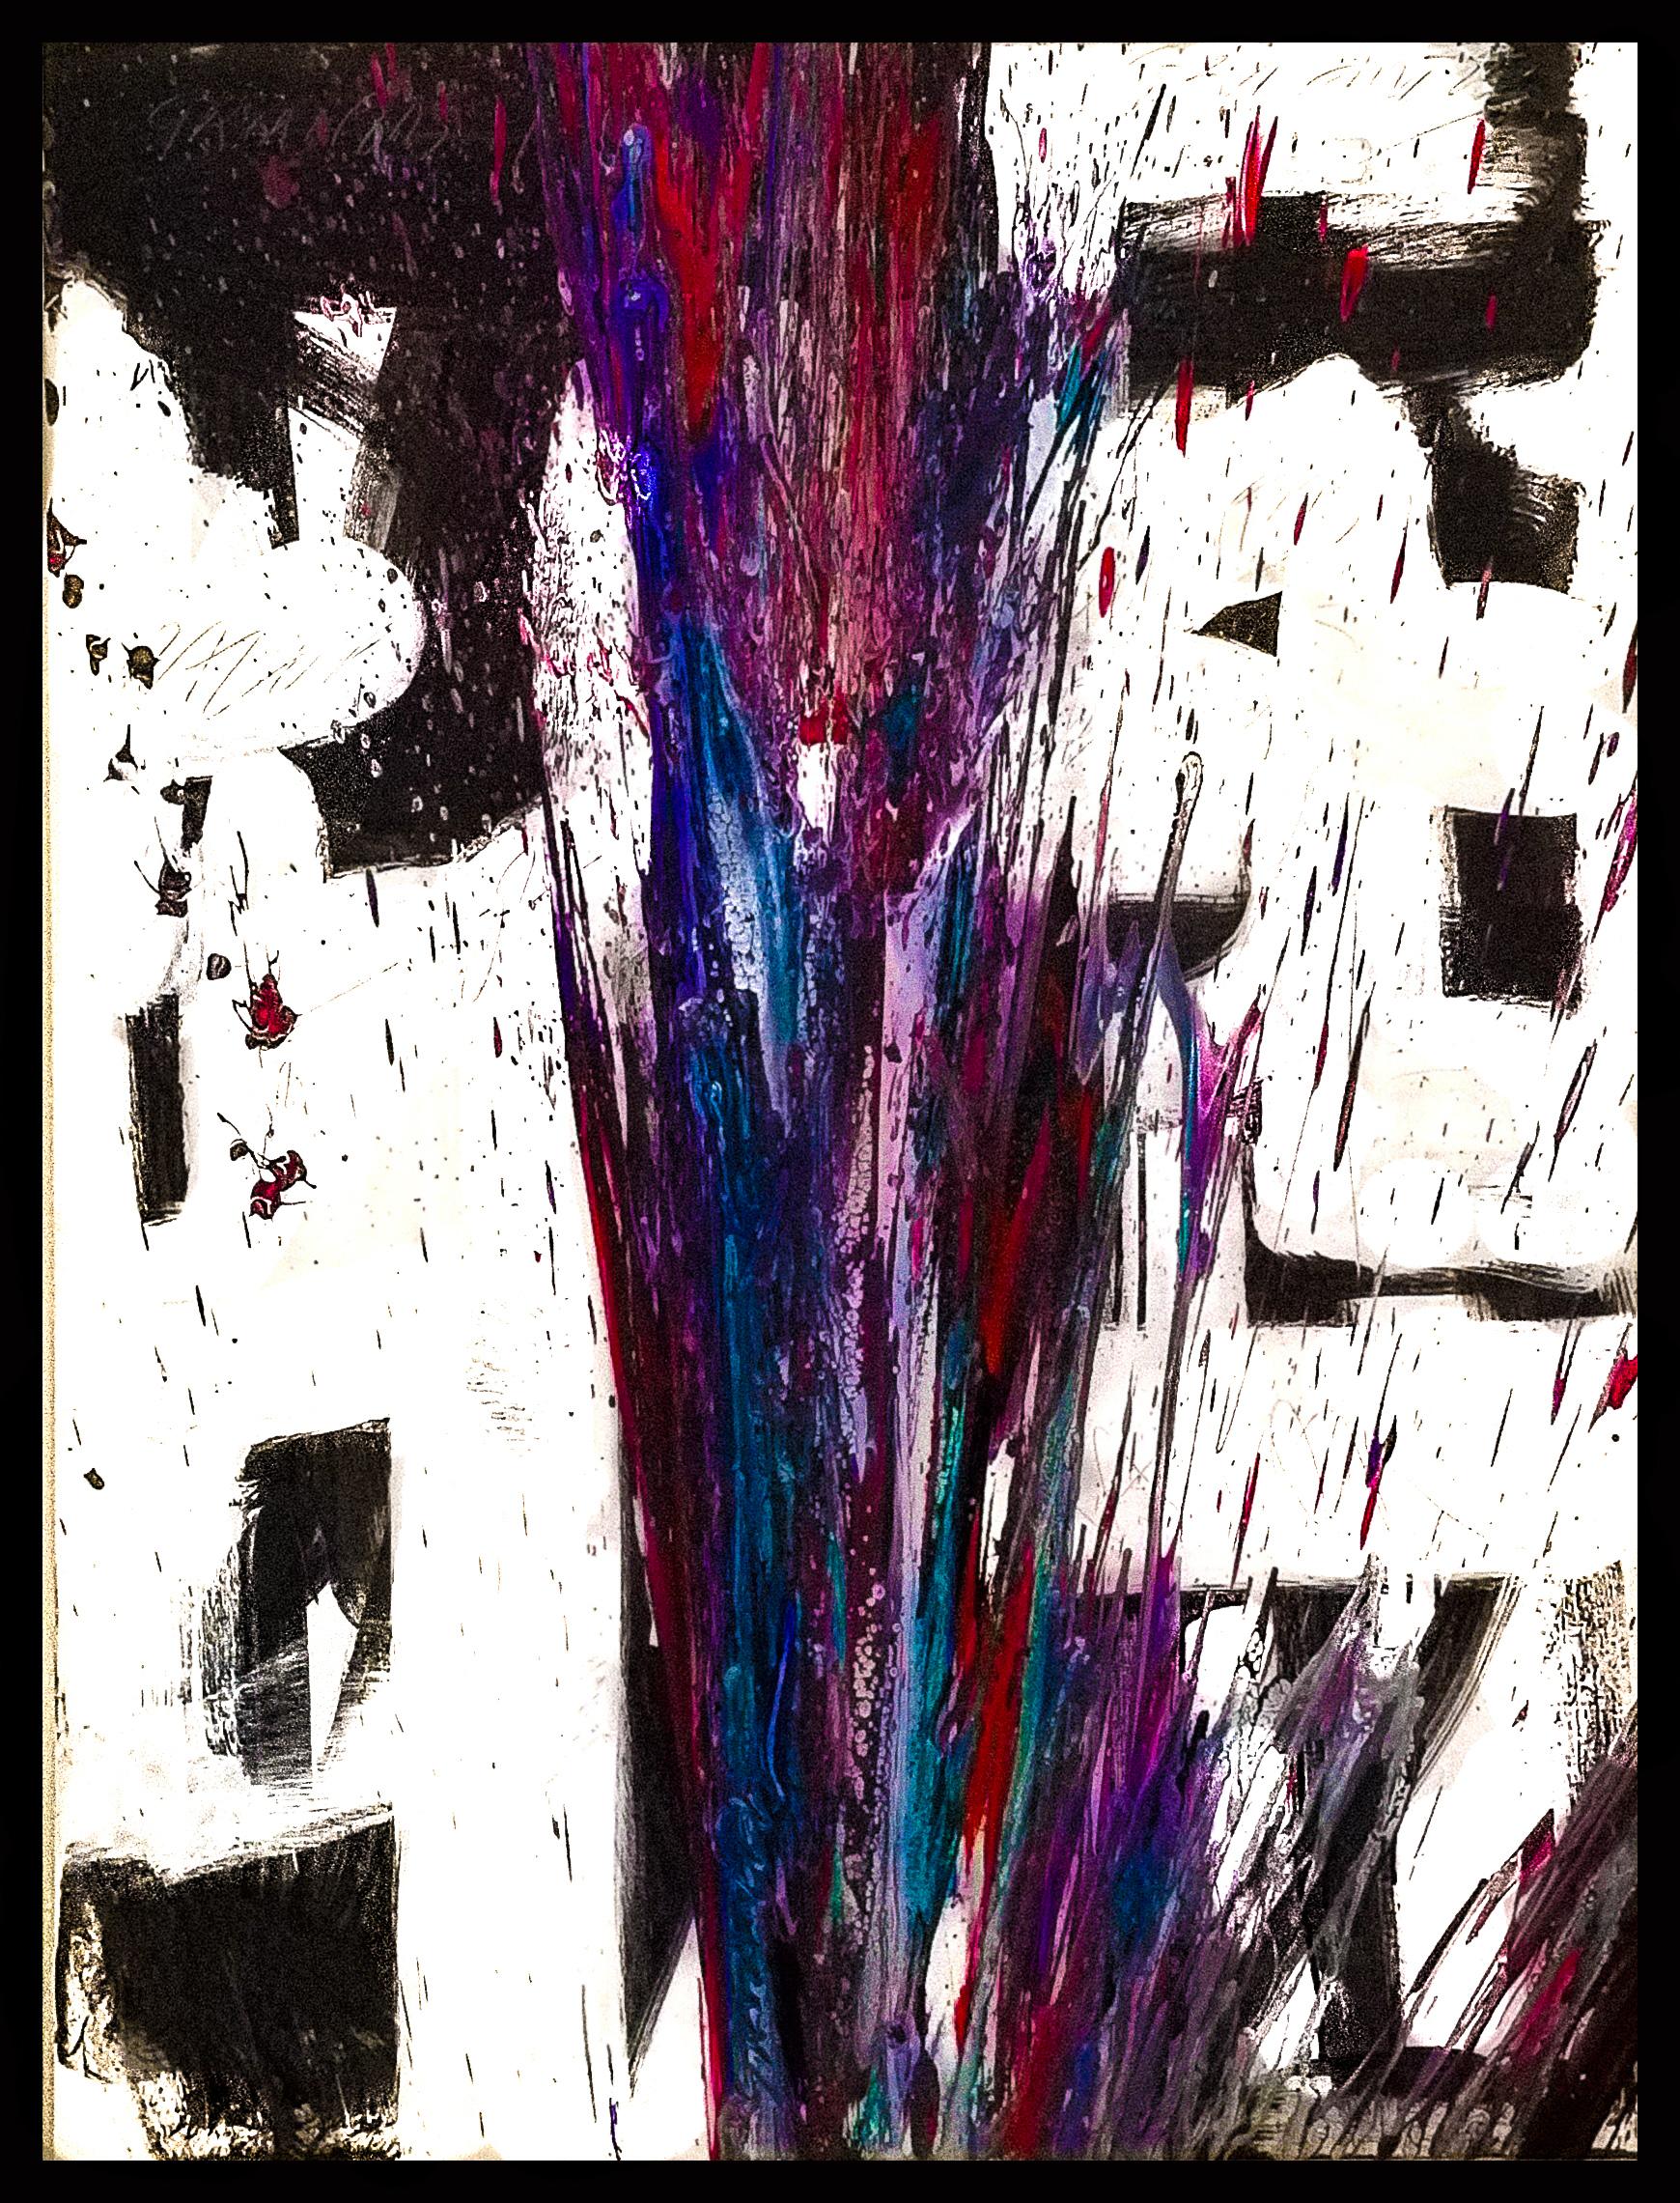 "Splash of Colour 2 #136, 2019, acrylic on canvas, 48"" x 36"" (122 x 91.4)"